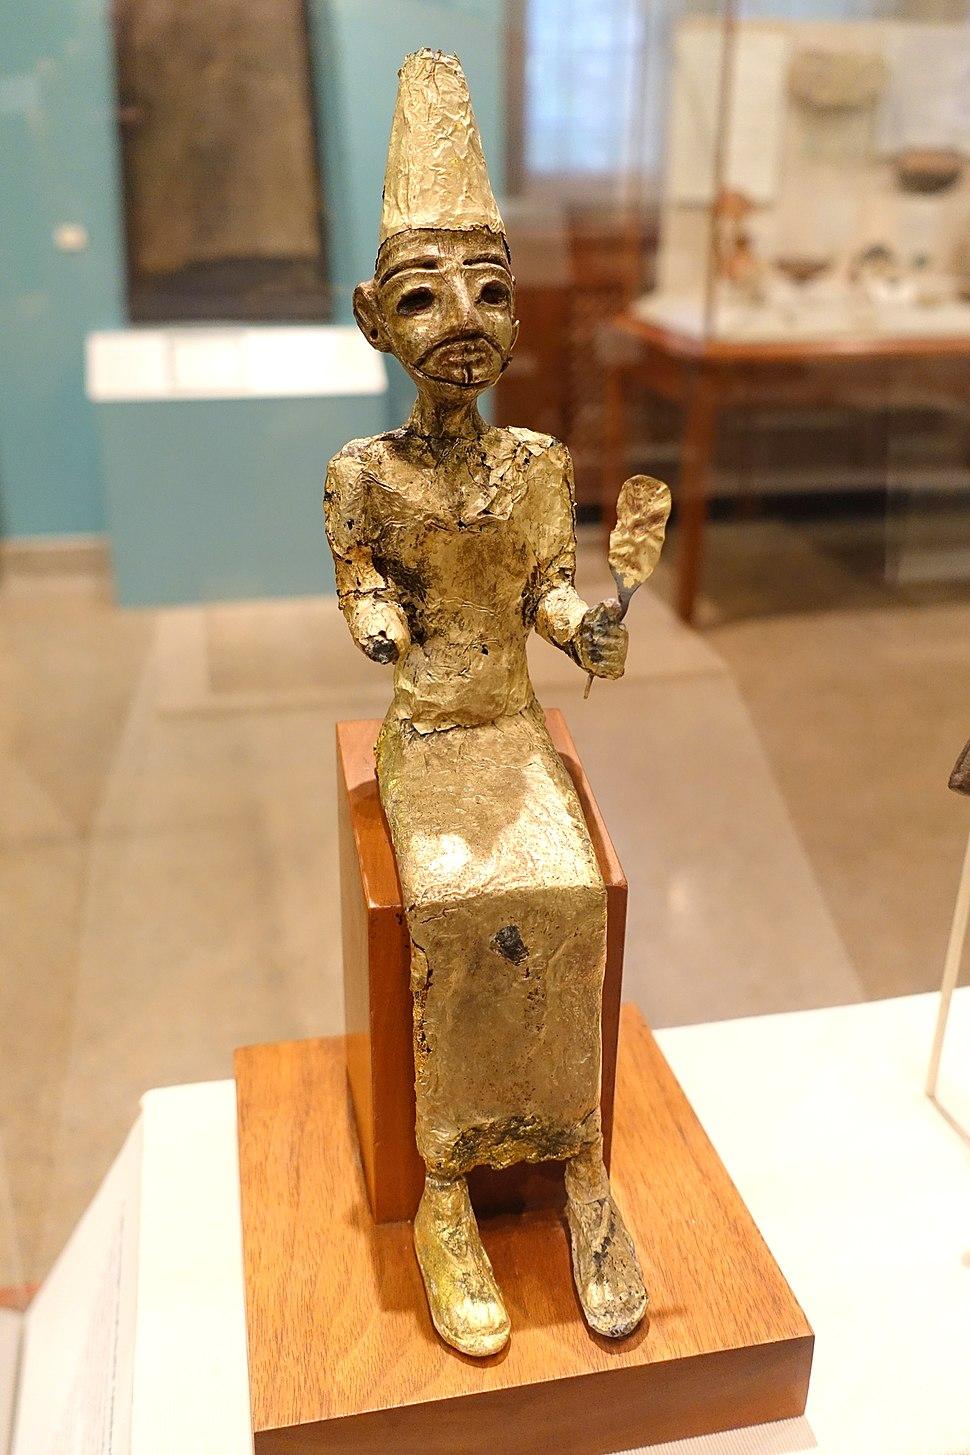 El, the Canaanite creator deity, Megiddo, Stratum VII, Late Bronze II, 1400-1200 BC, bronze with gold leaf - Oriental Institute Museum, University of Chicago - DSC07734